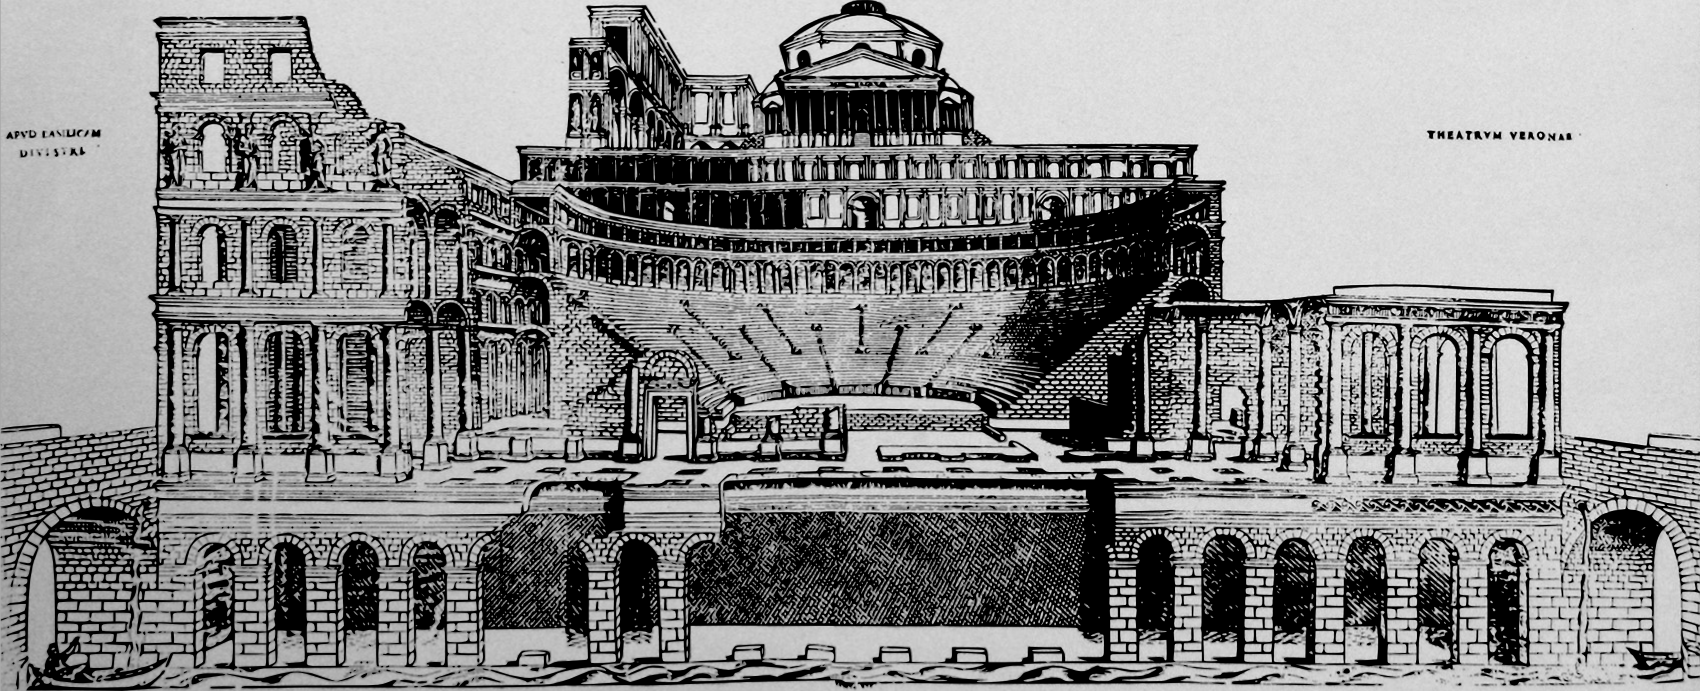 File:Teatro romano VR.png - Wikimedia Commons